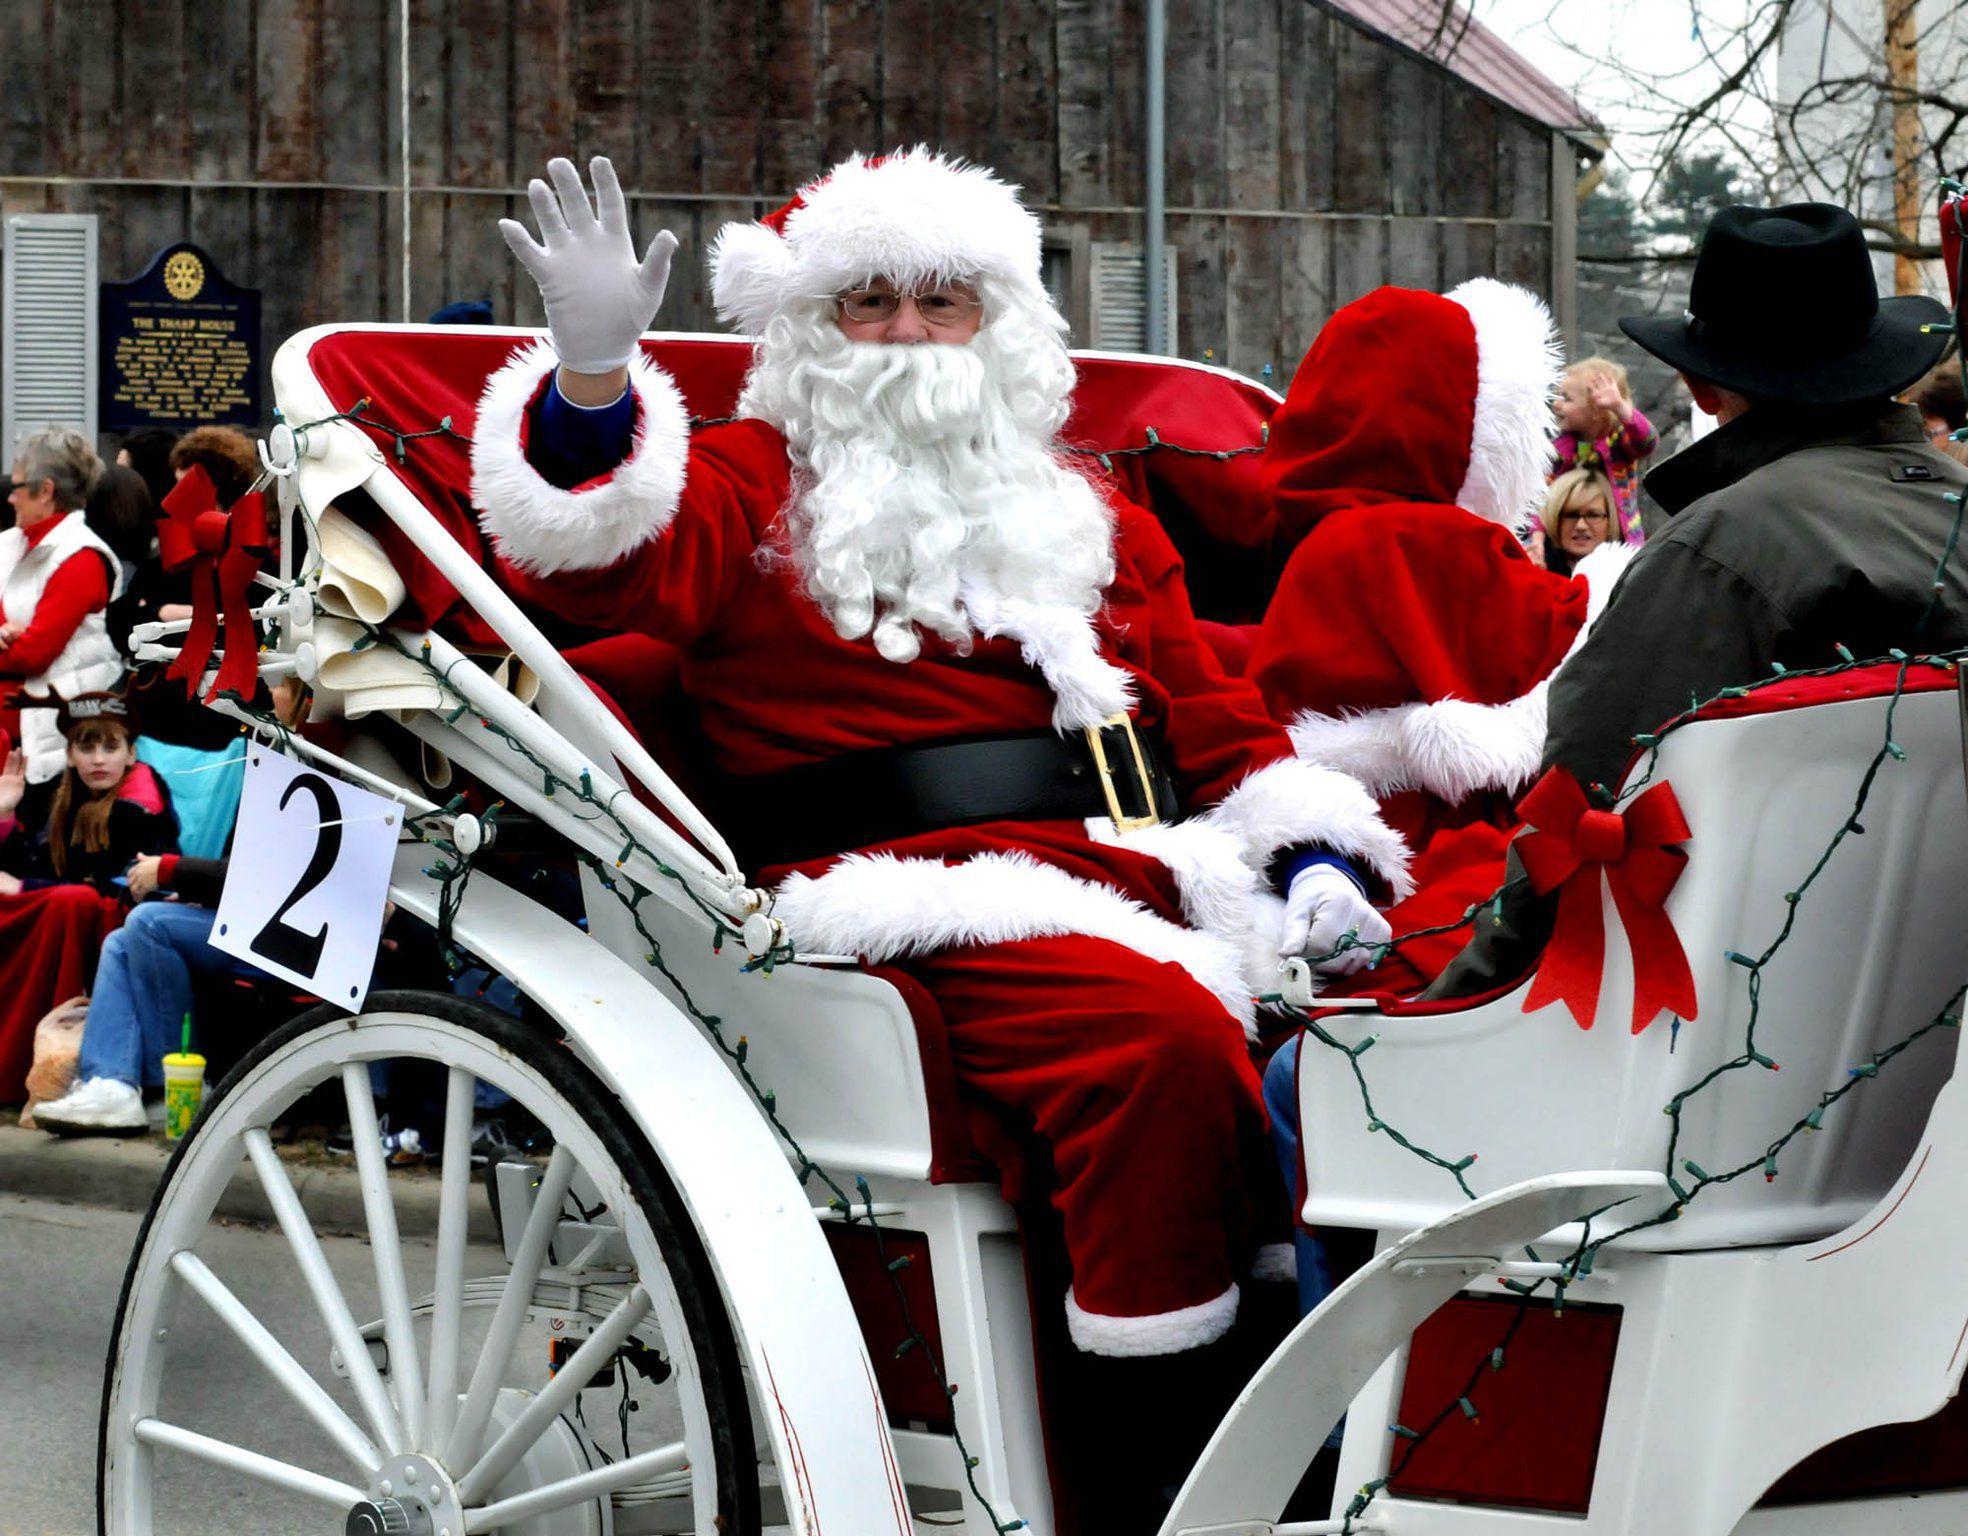 Lebananon Carriage Parade And Christmas Festival Lebanon Oh